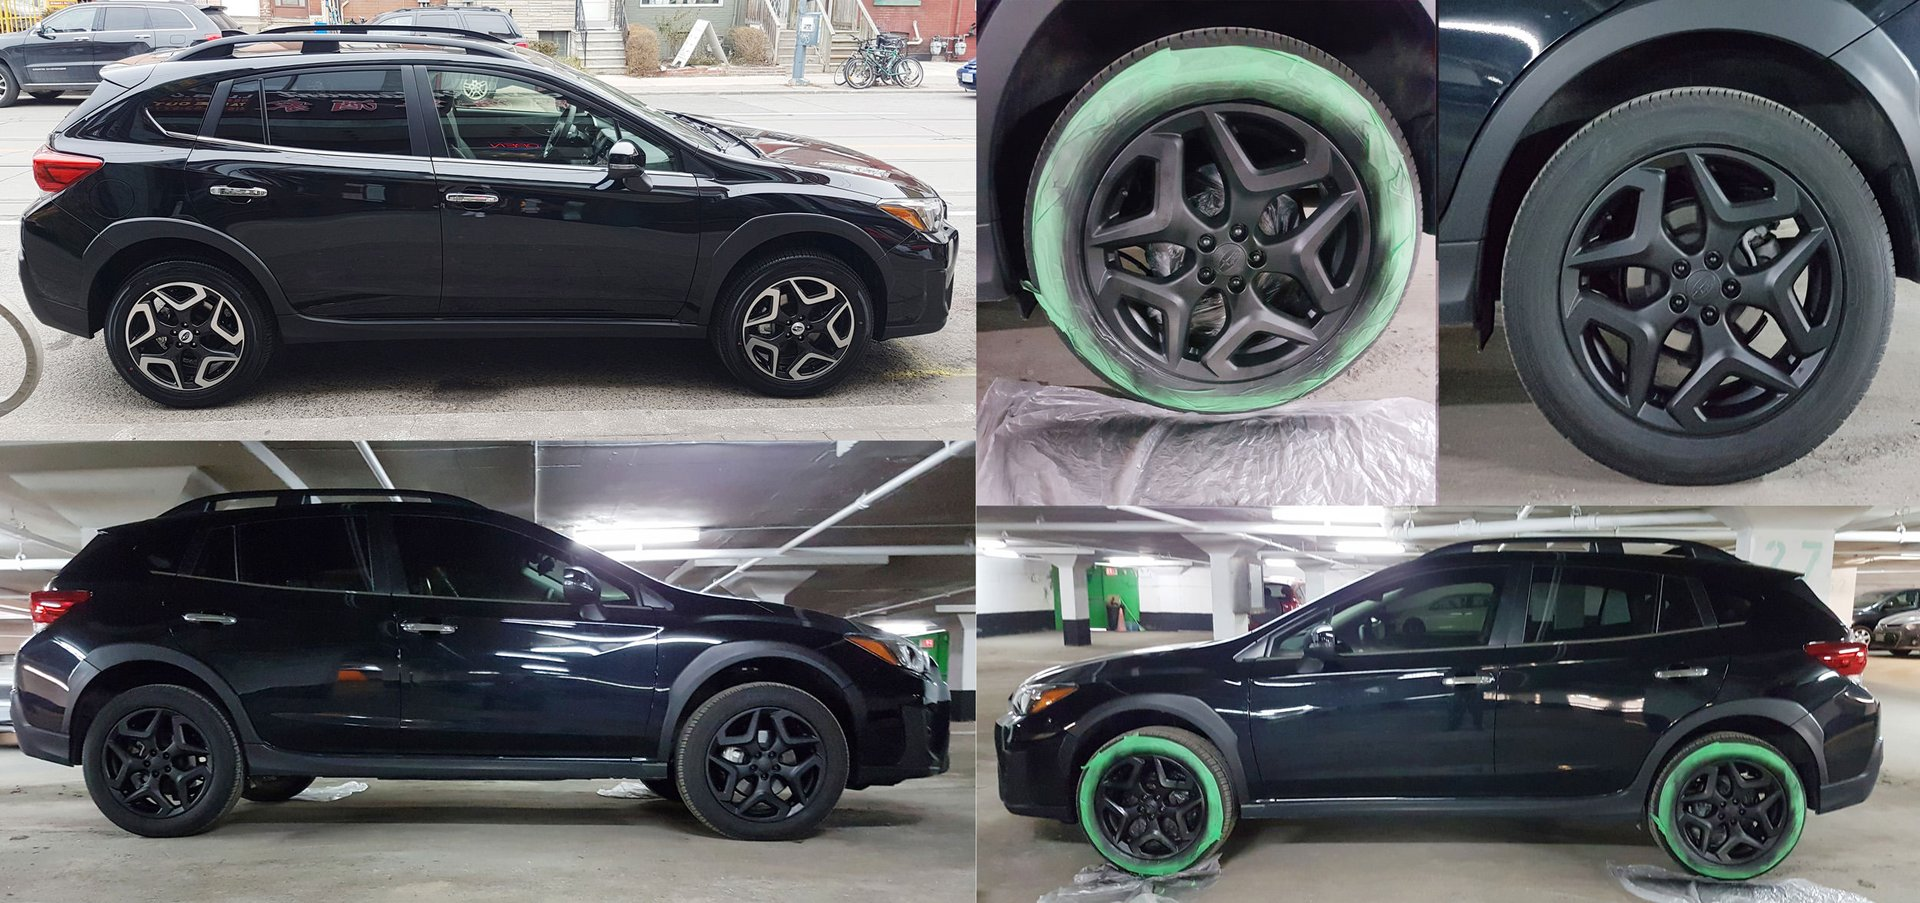 2018 Crosstrek Wheels Car News And Reviews